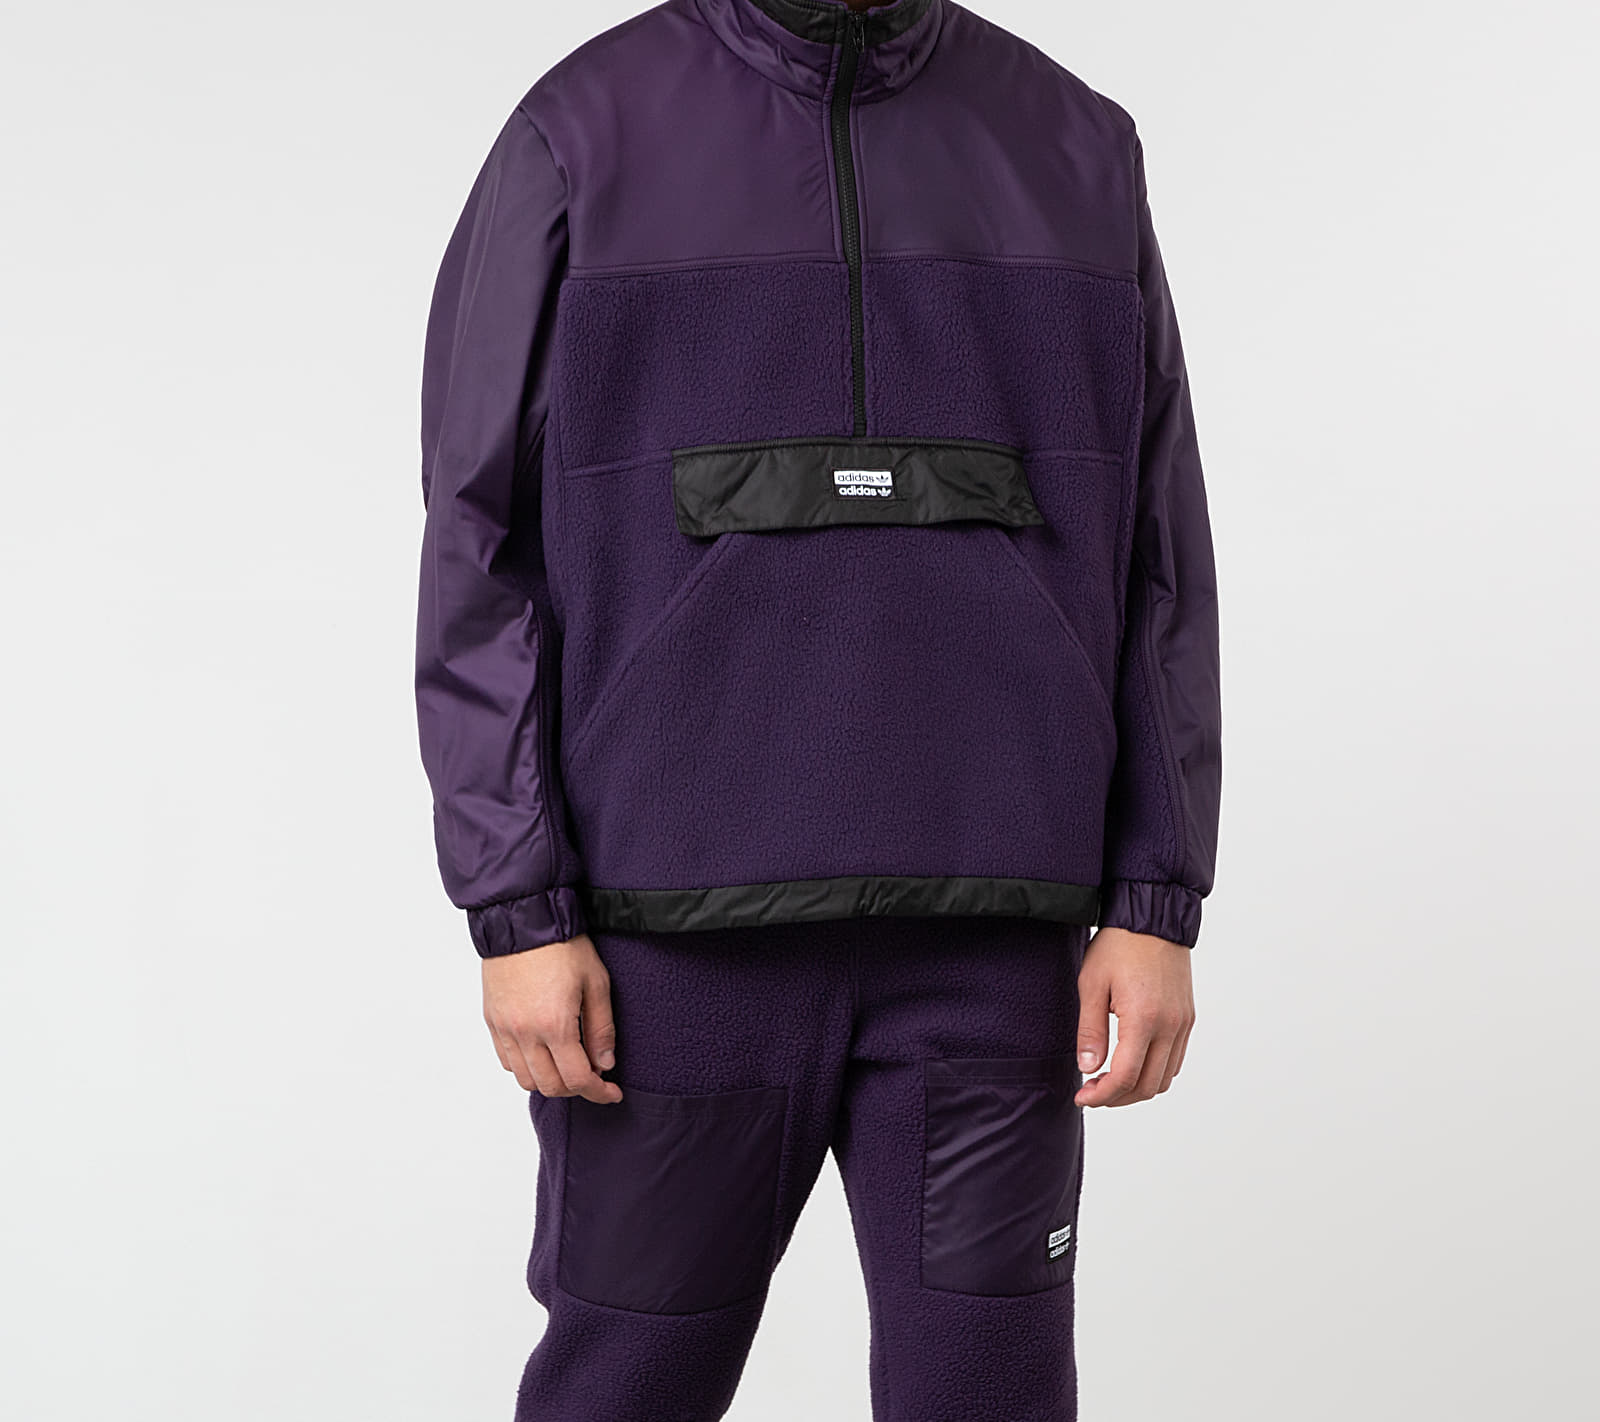 adidas R.Y.V. Lit Track Top Legend Purple